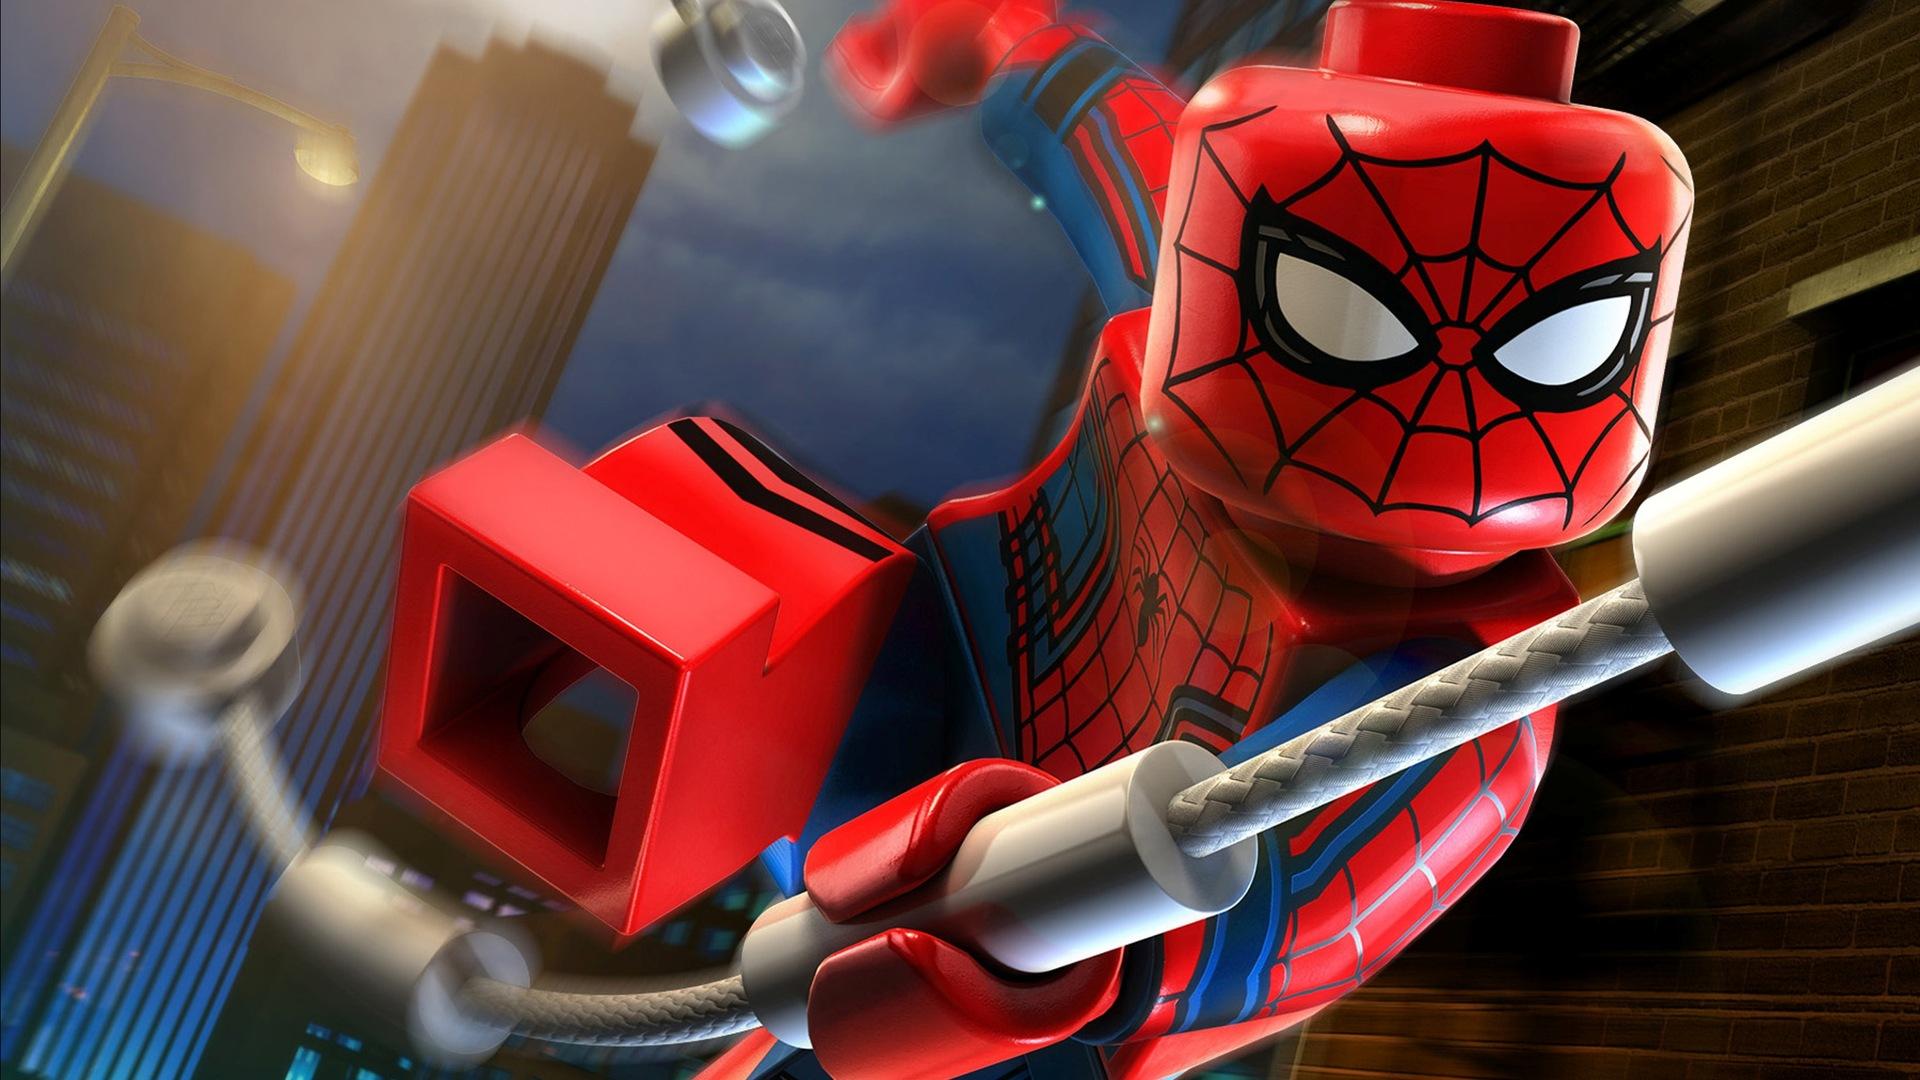 1920x1080 Lego Spiderman Homecoming Laptop Full Hd 1080p Hd